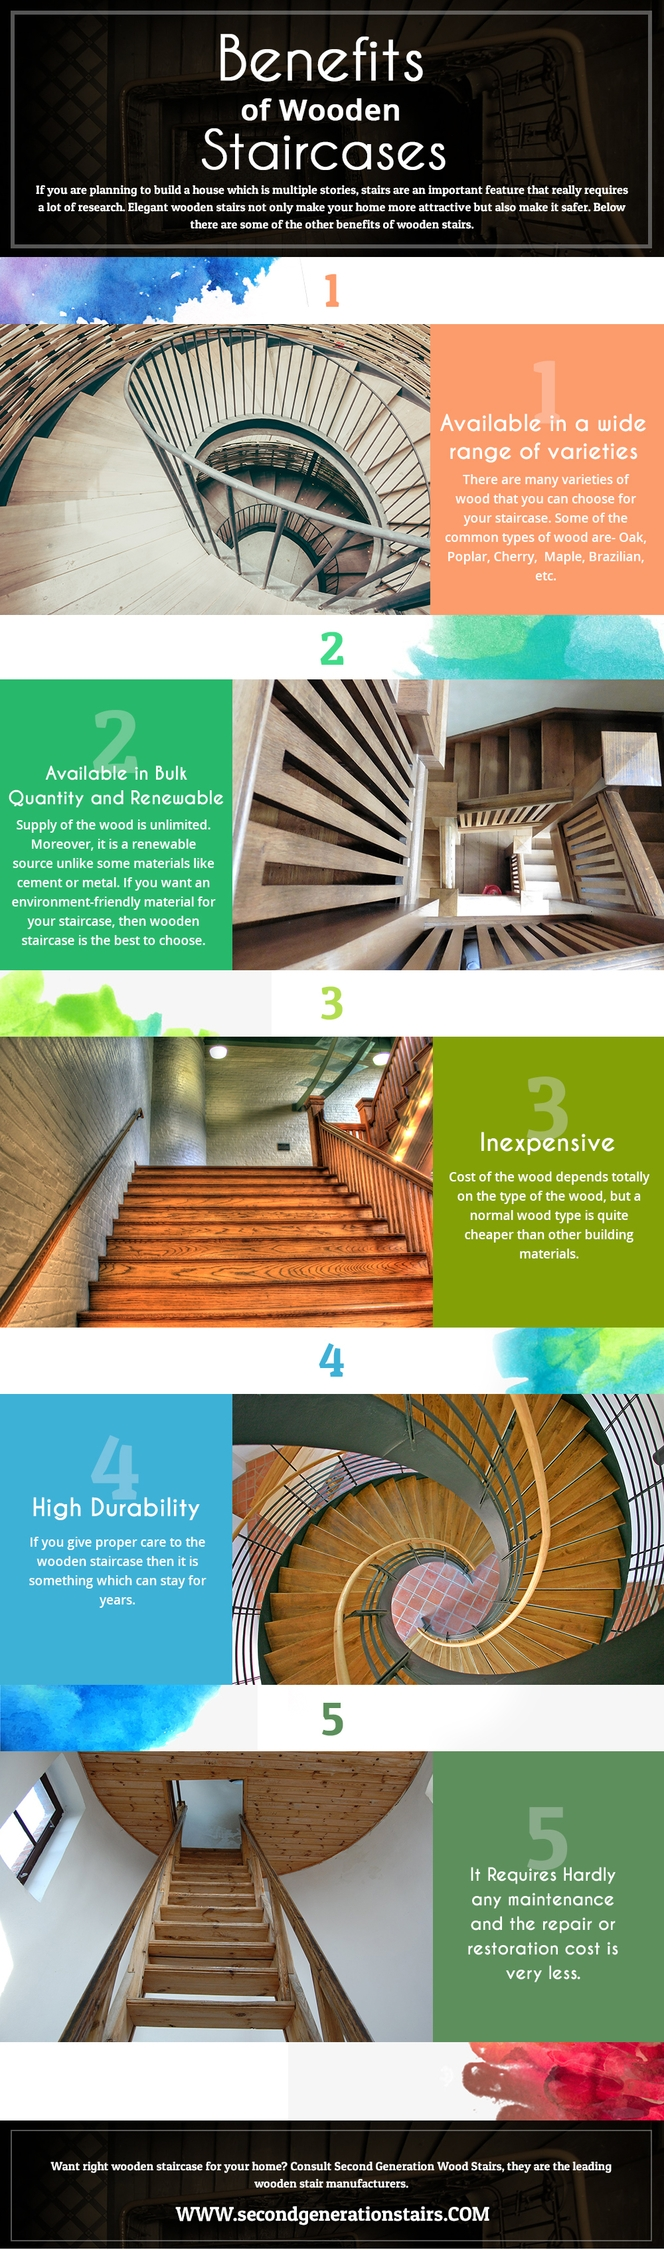 benefits wooden stairs - secondgneration | ello